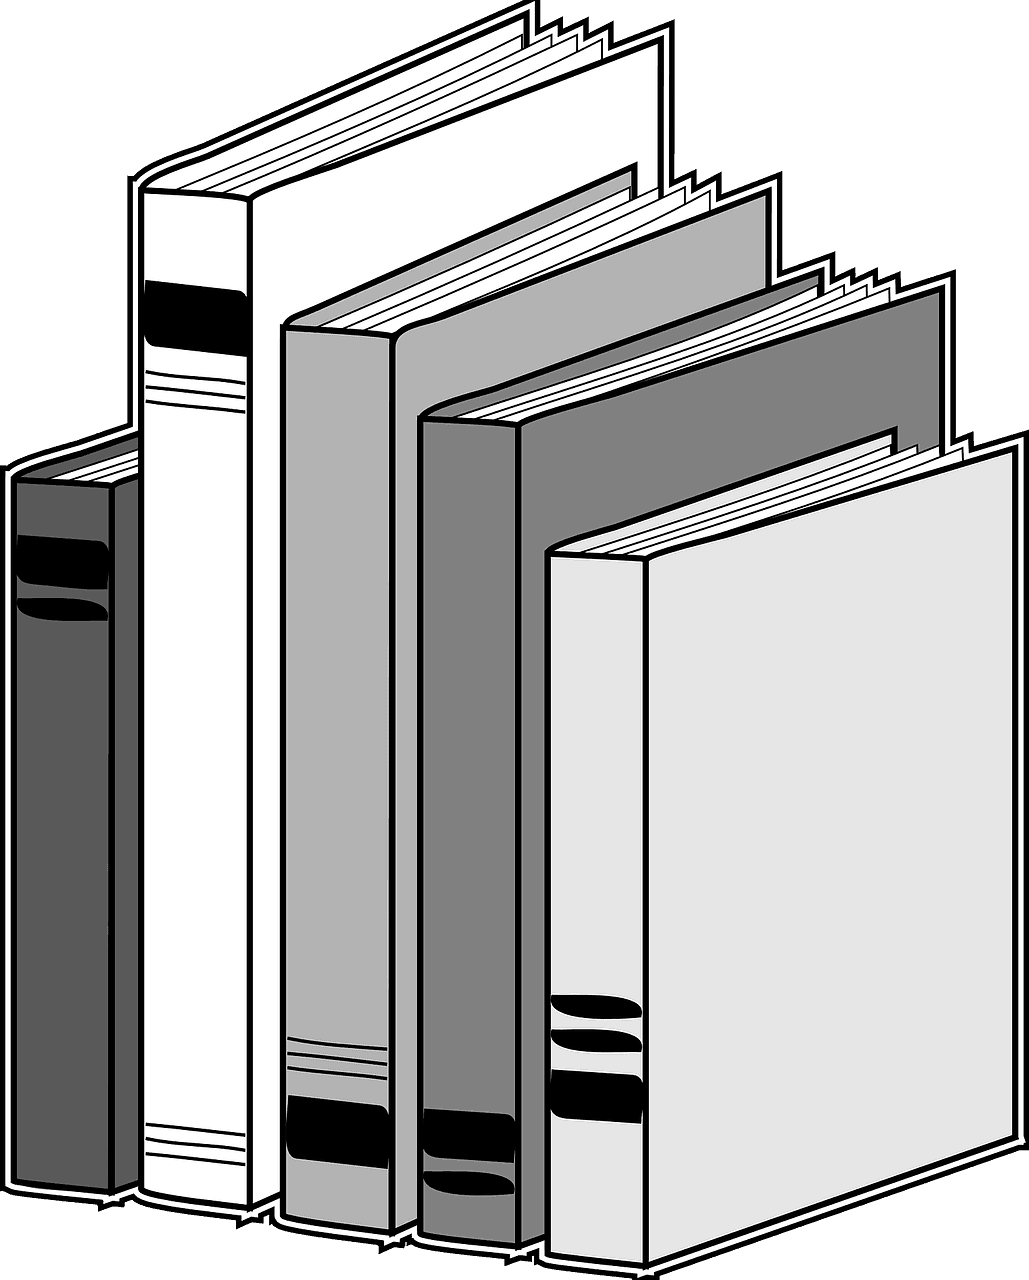 A set of novels